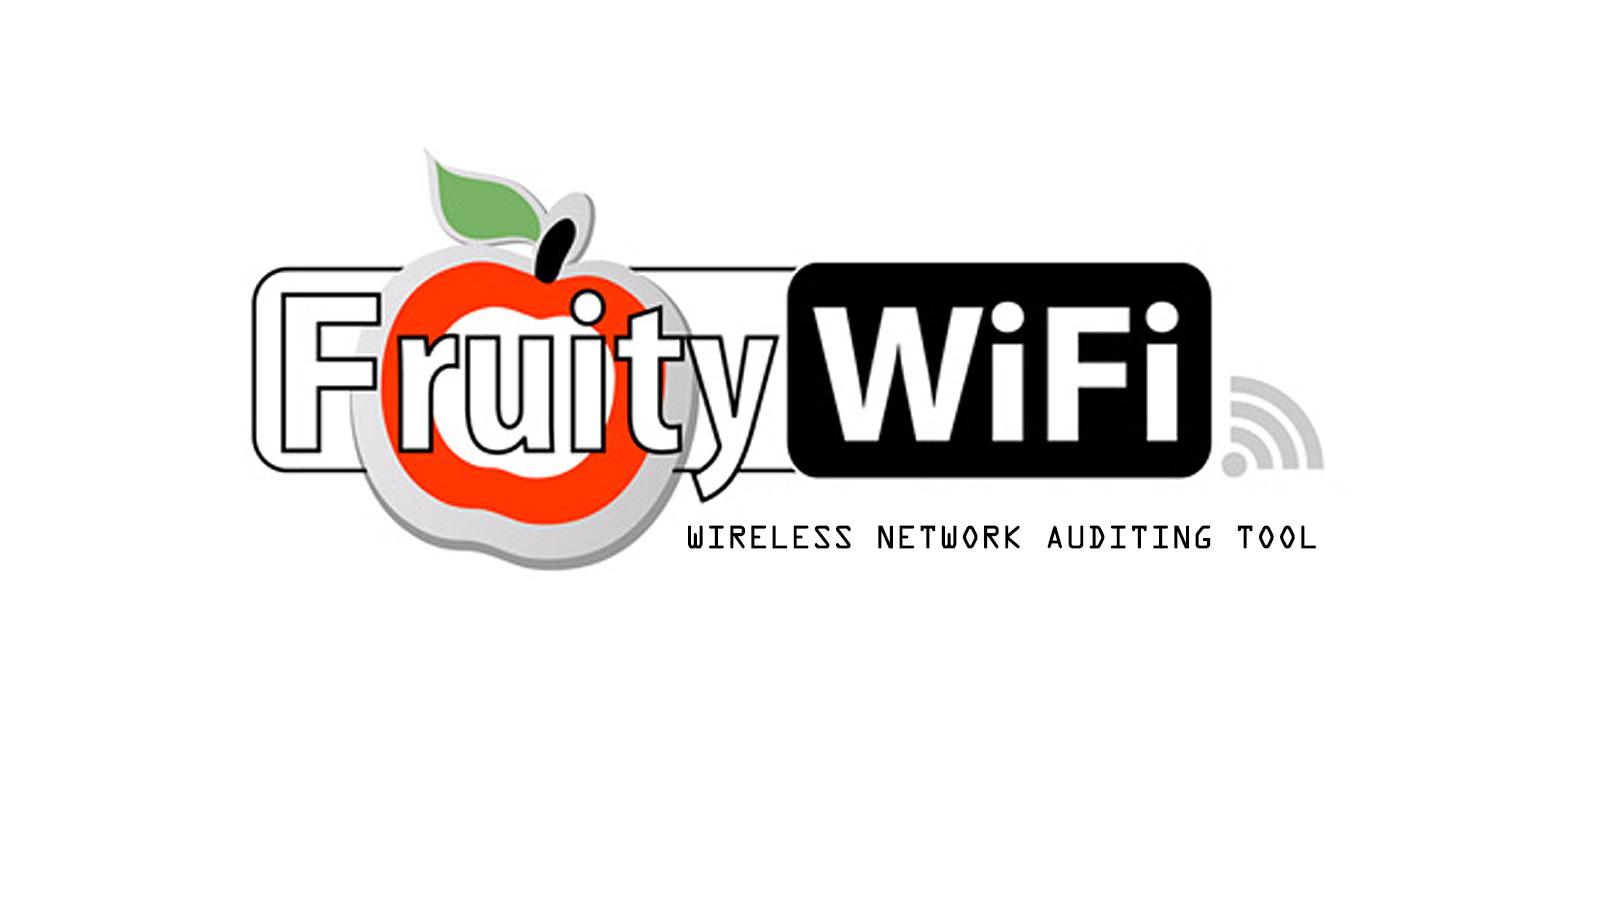 FruityWiFi  WiFi Network Auditing Tool